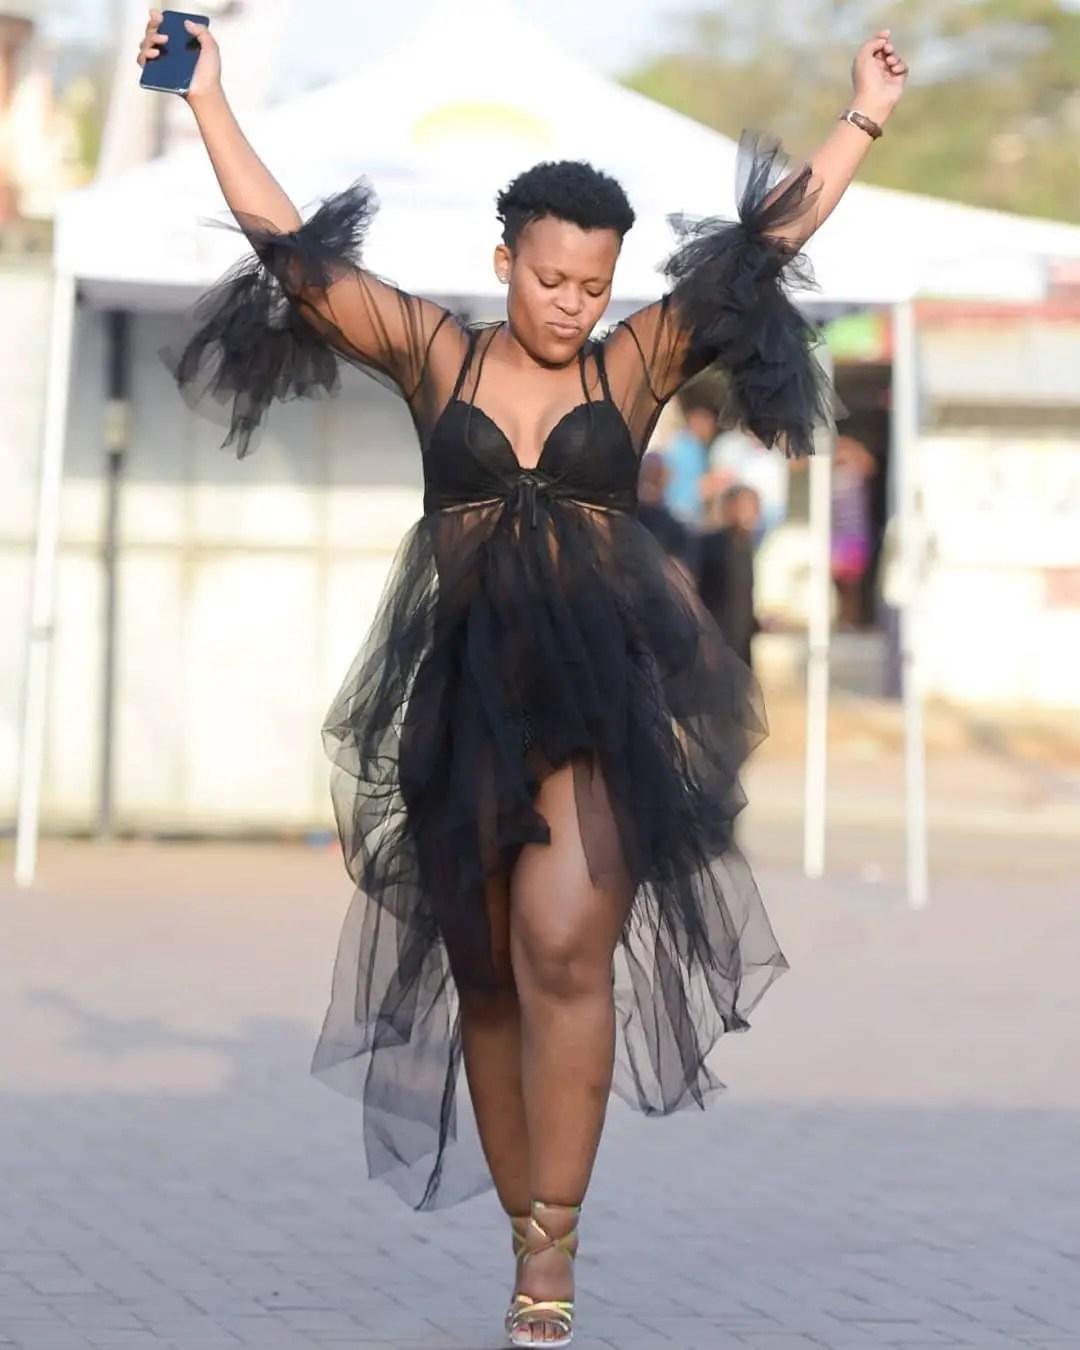 Zodwa Wabantu's outfit